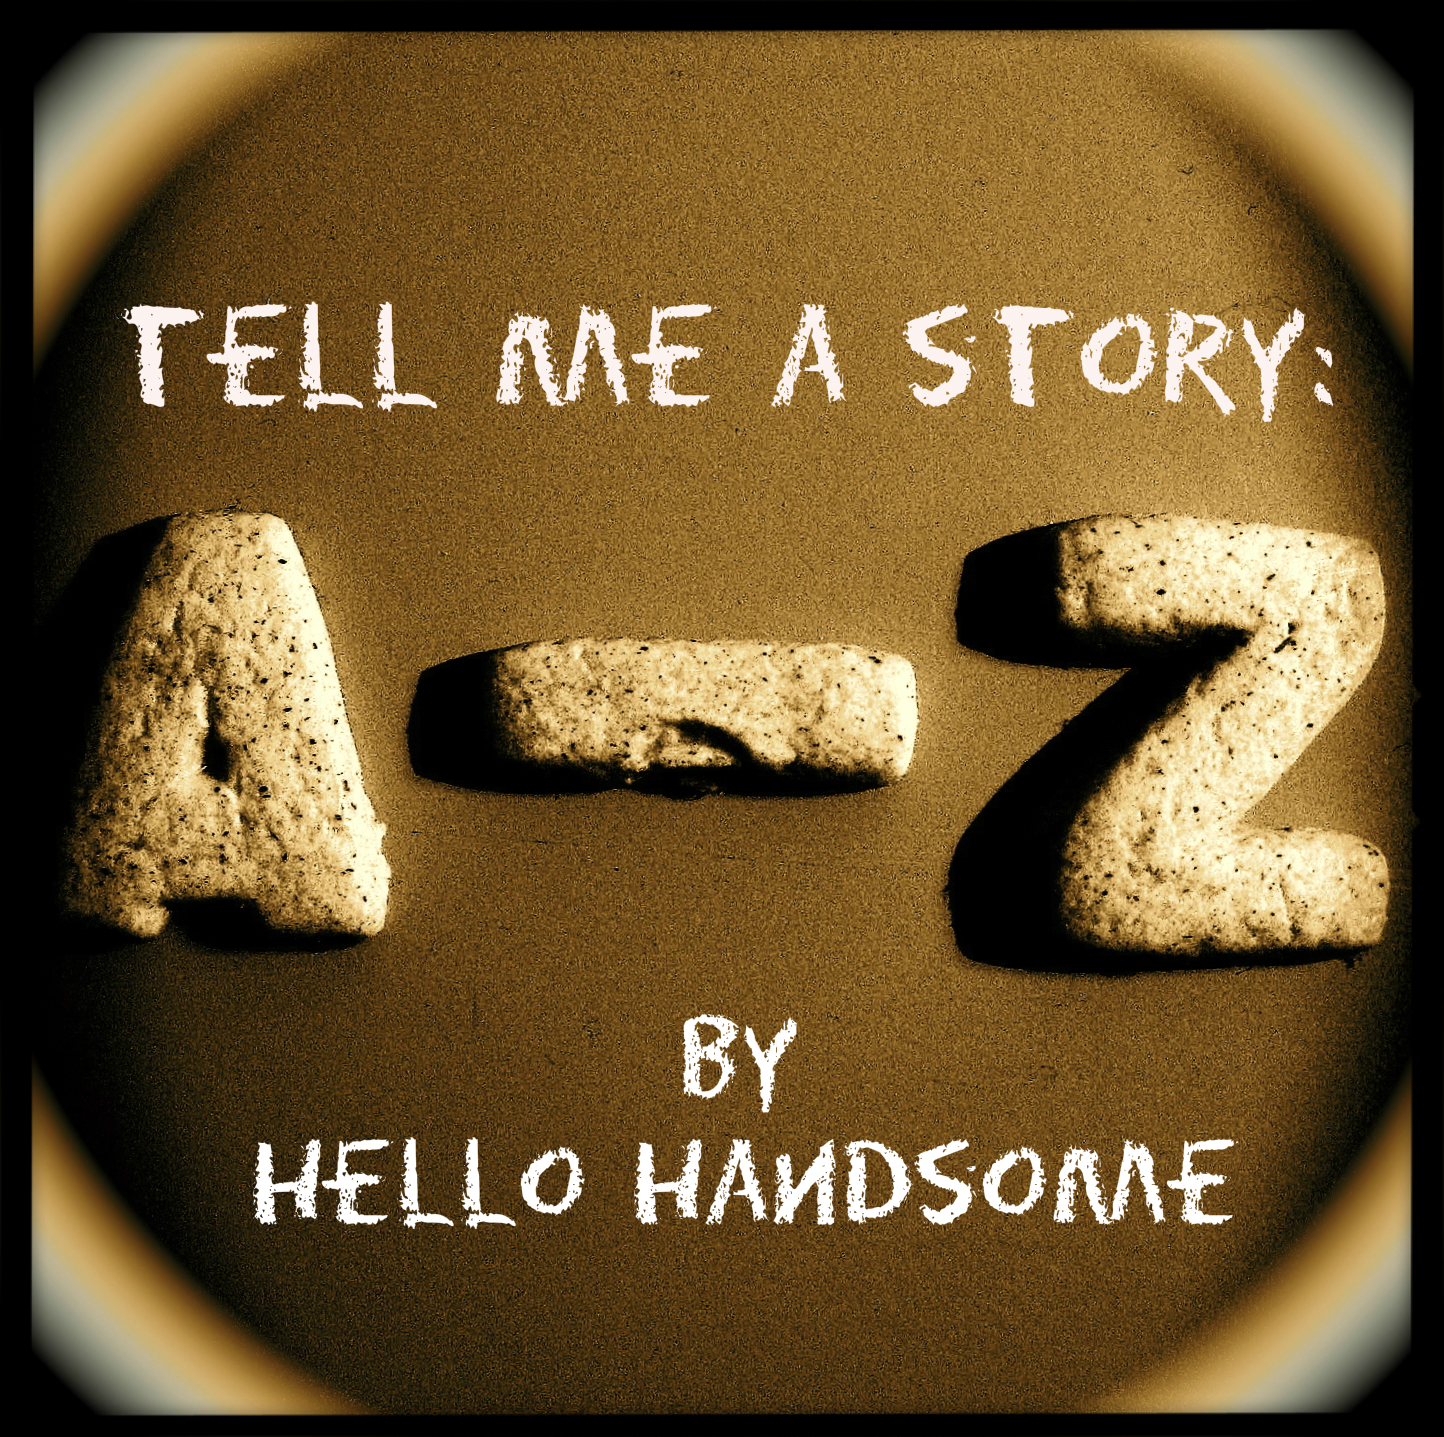 Hellohandsome Tell Me A Story Z Album Cover